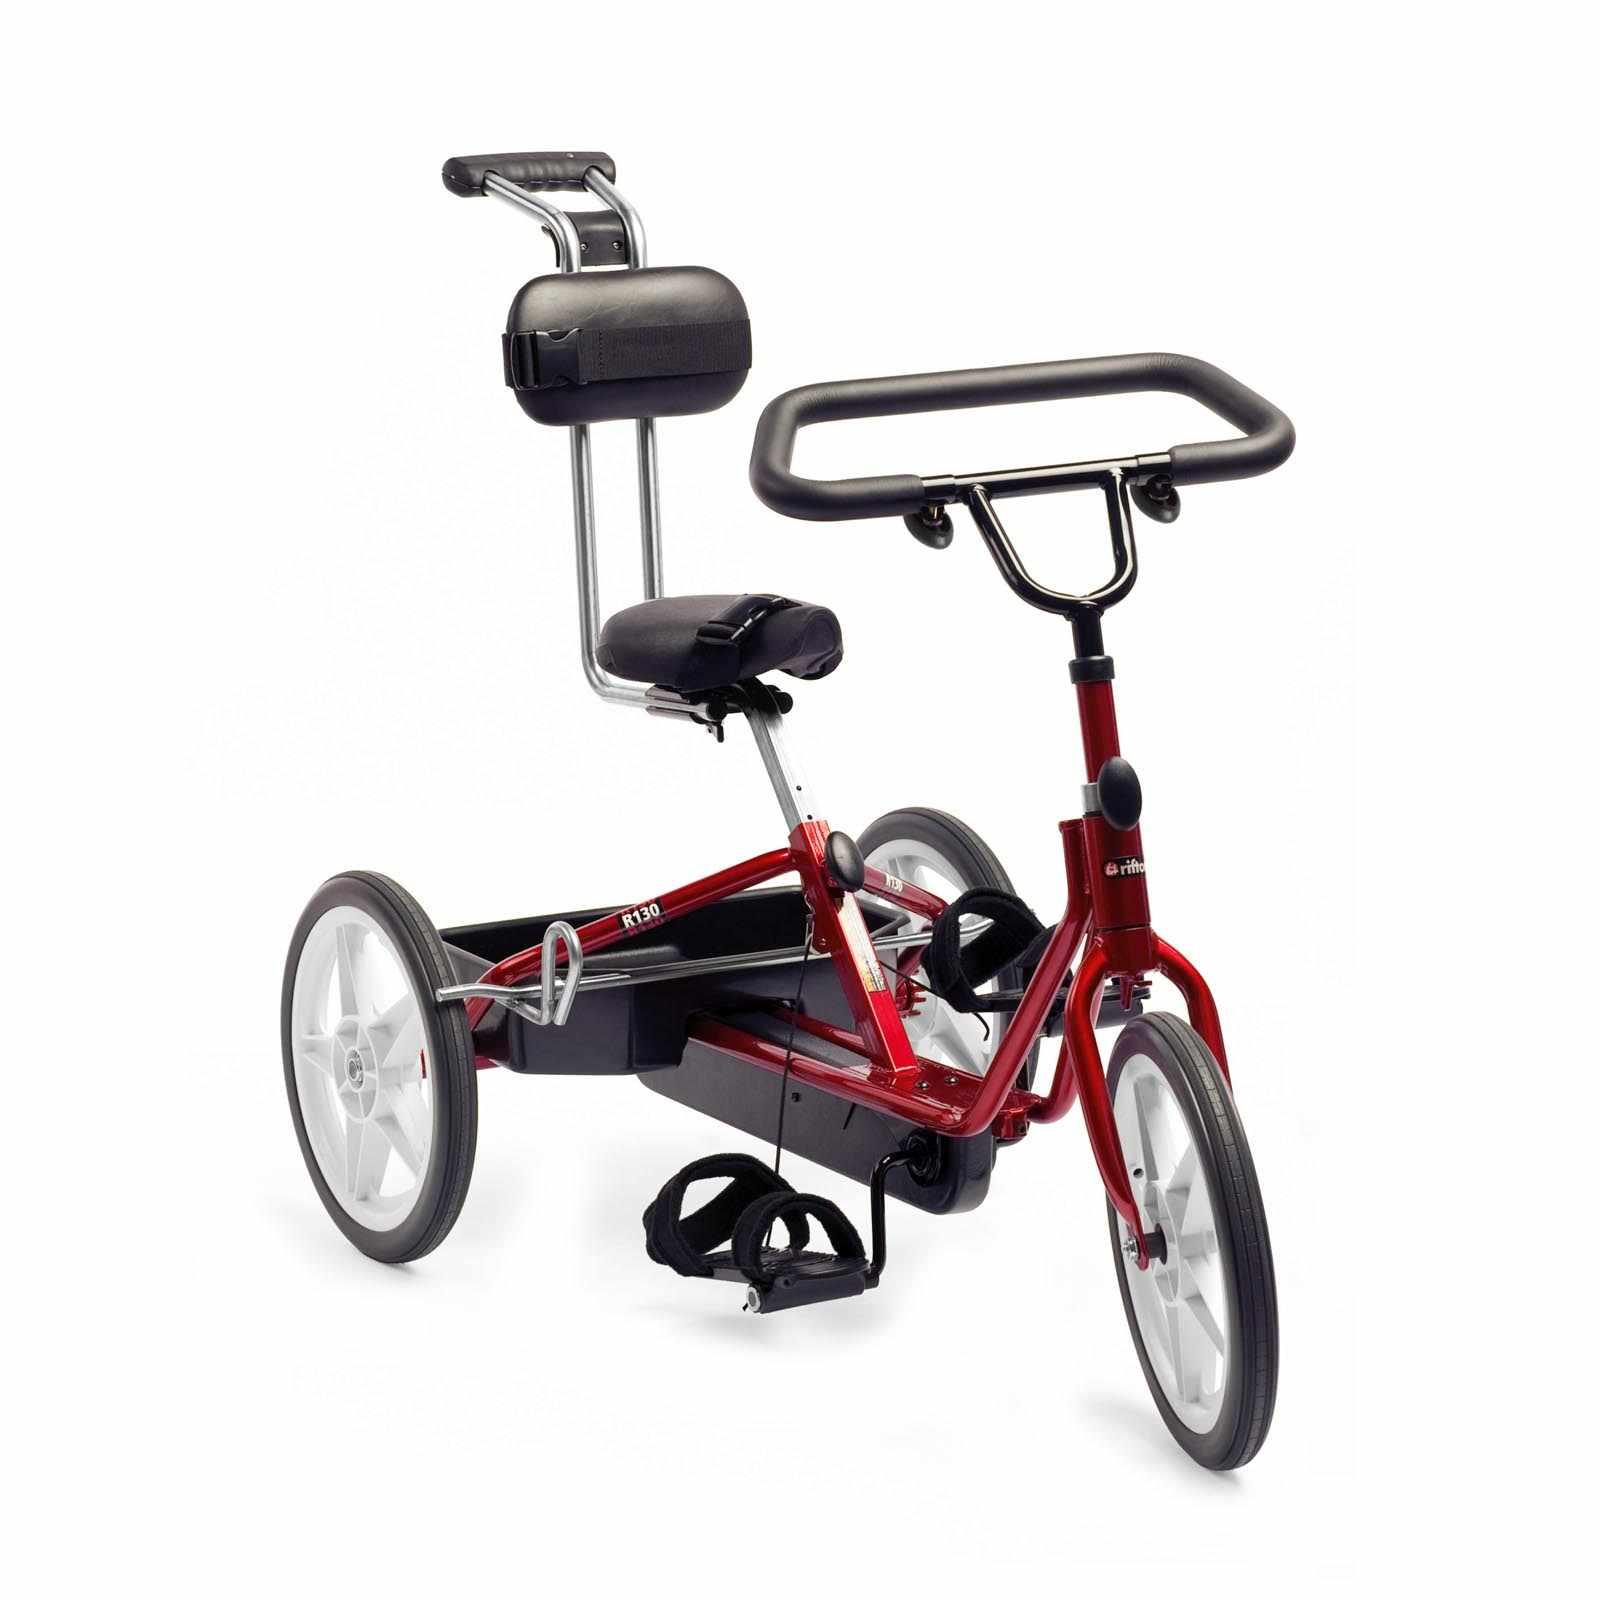 Rifton medium adaptive tricycle